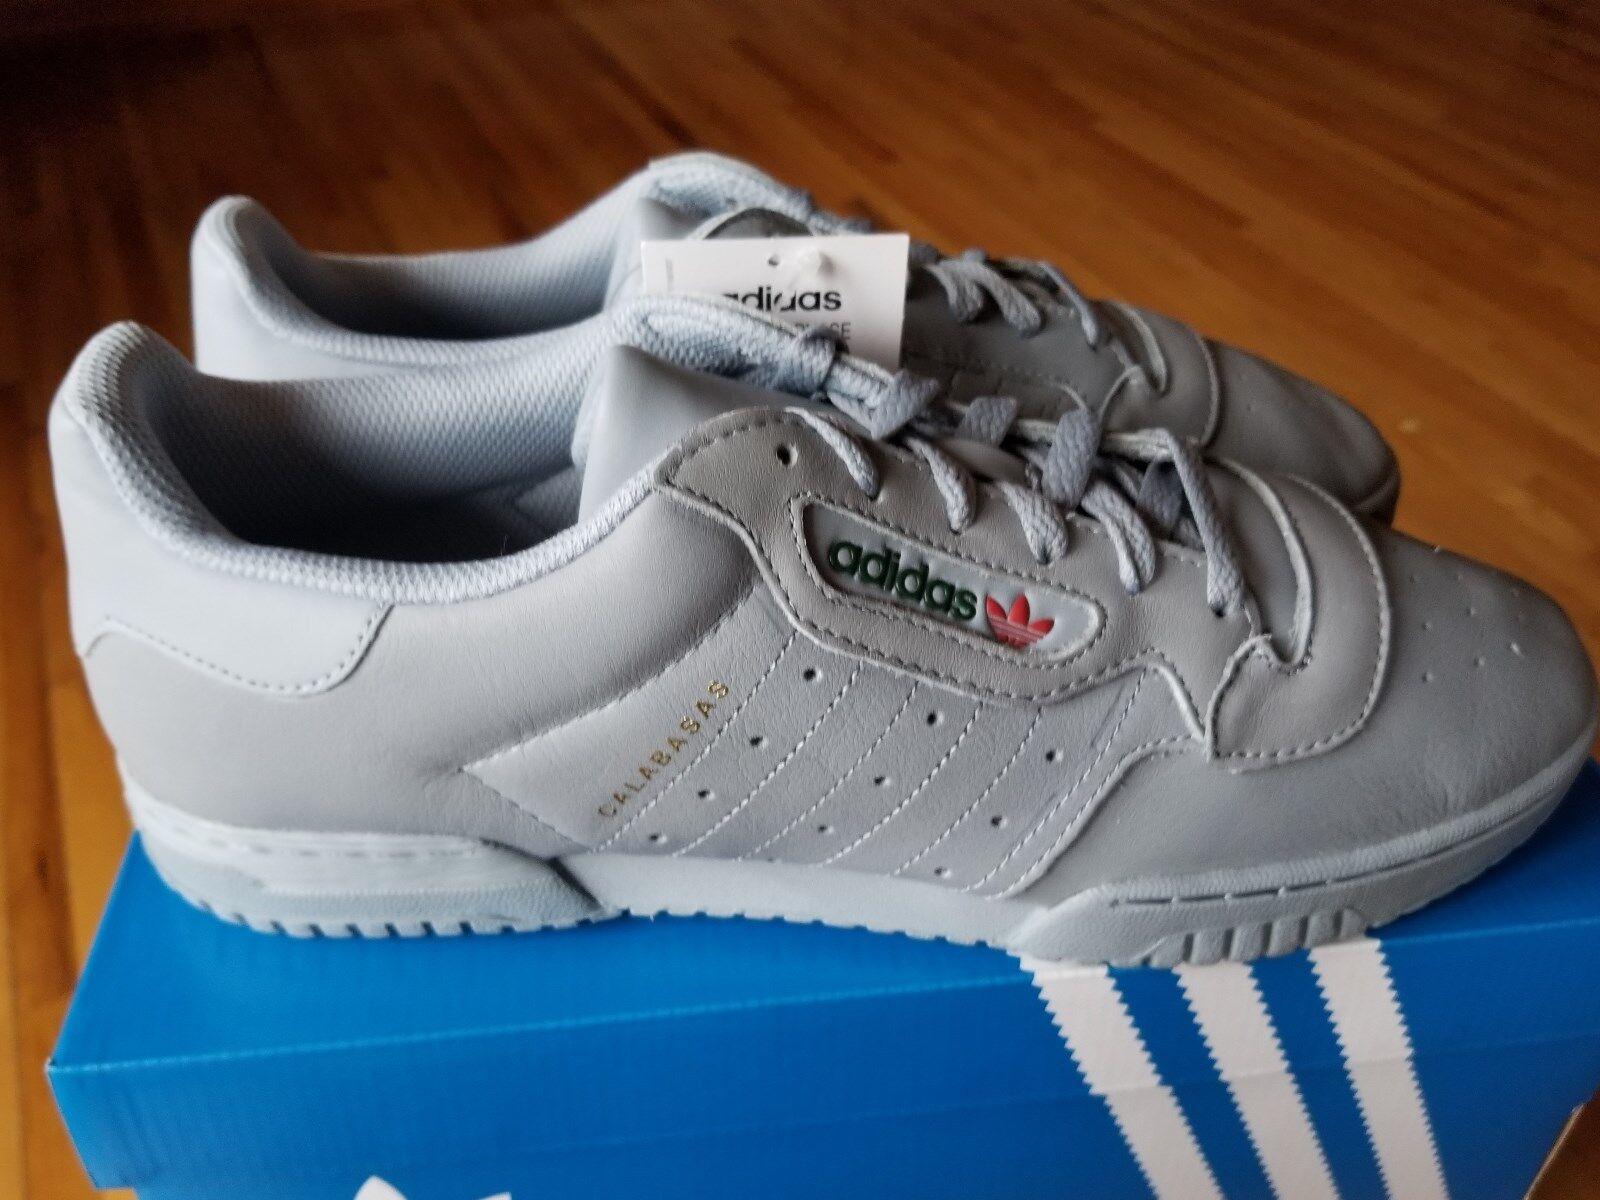 Adidas yeezy powerphase calabasas in grau cg6422 neu in calabasas der box 88e8b1